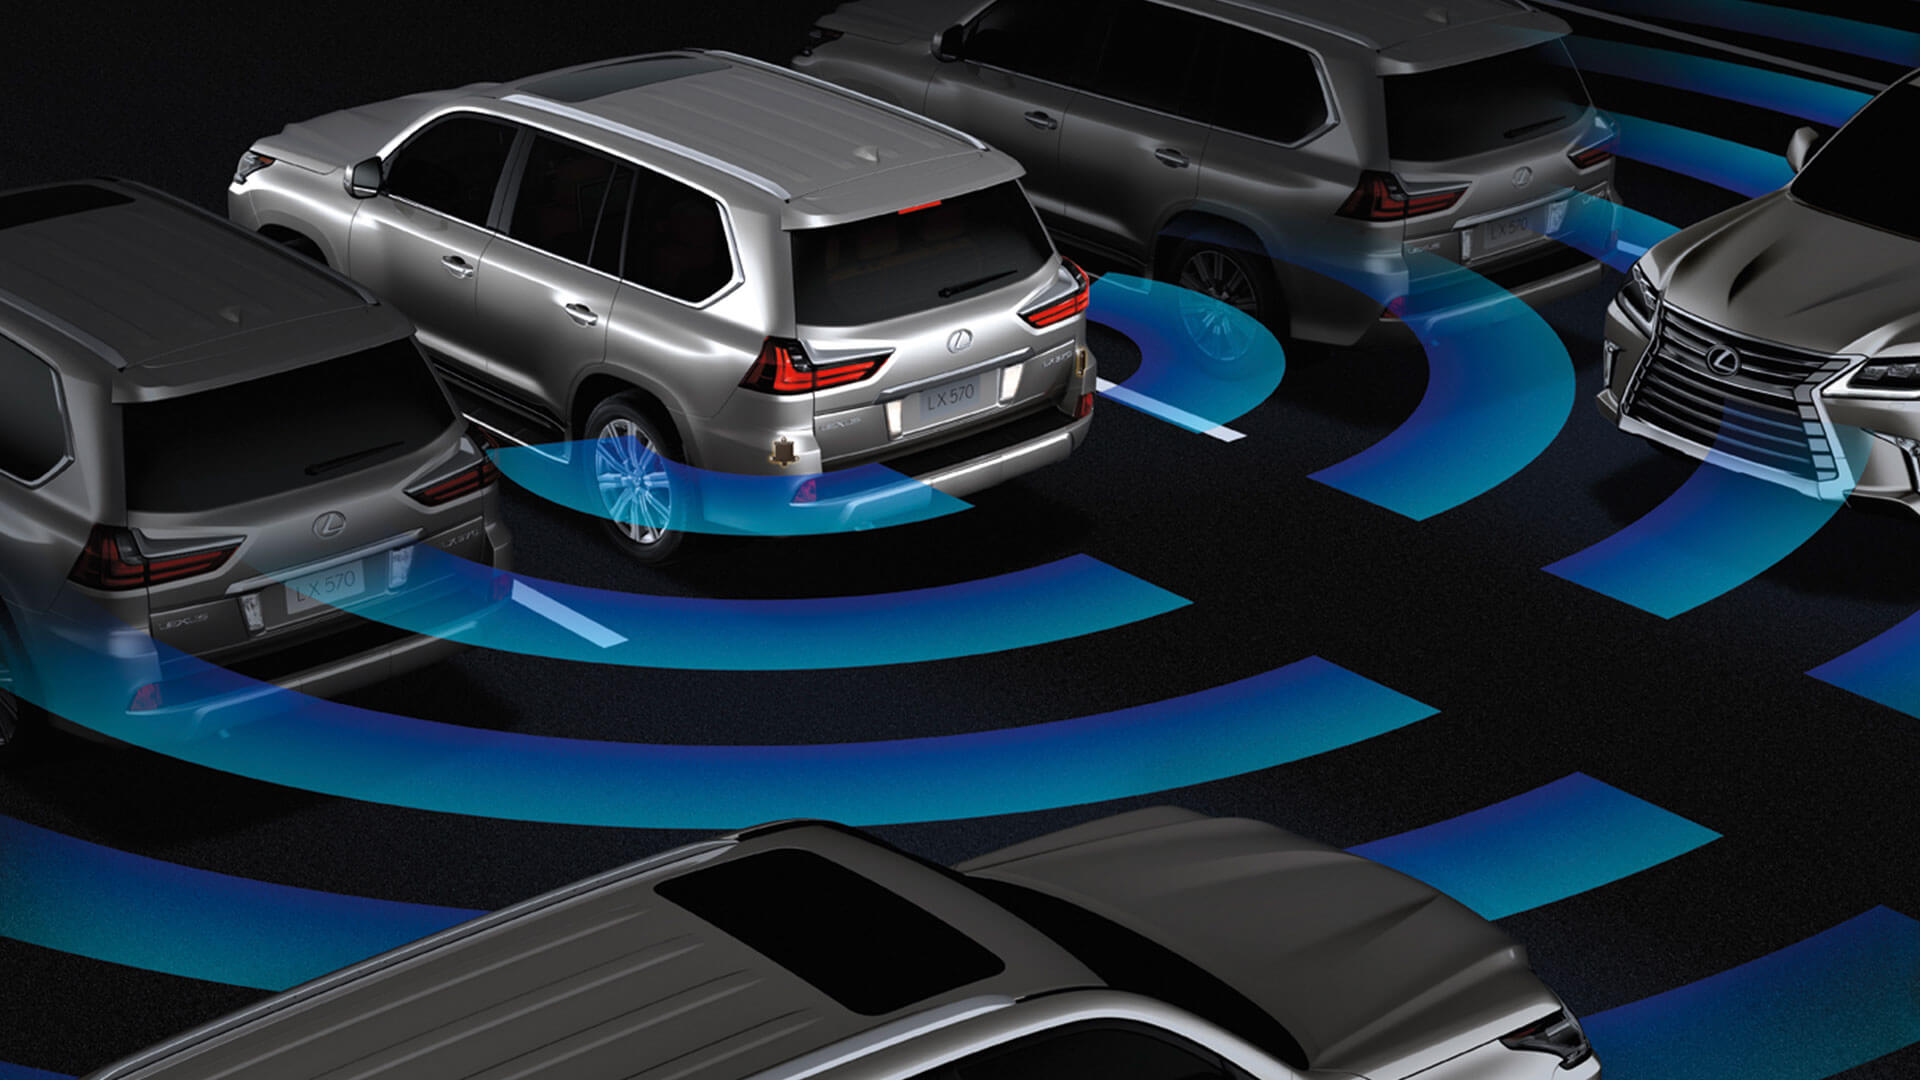 2017 lexus lx features parking assist monitor